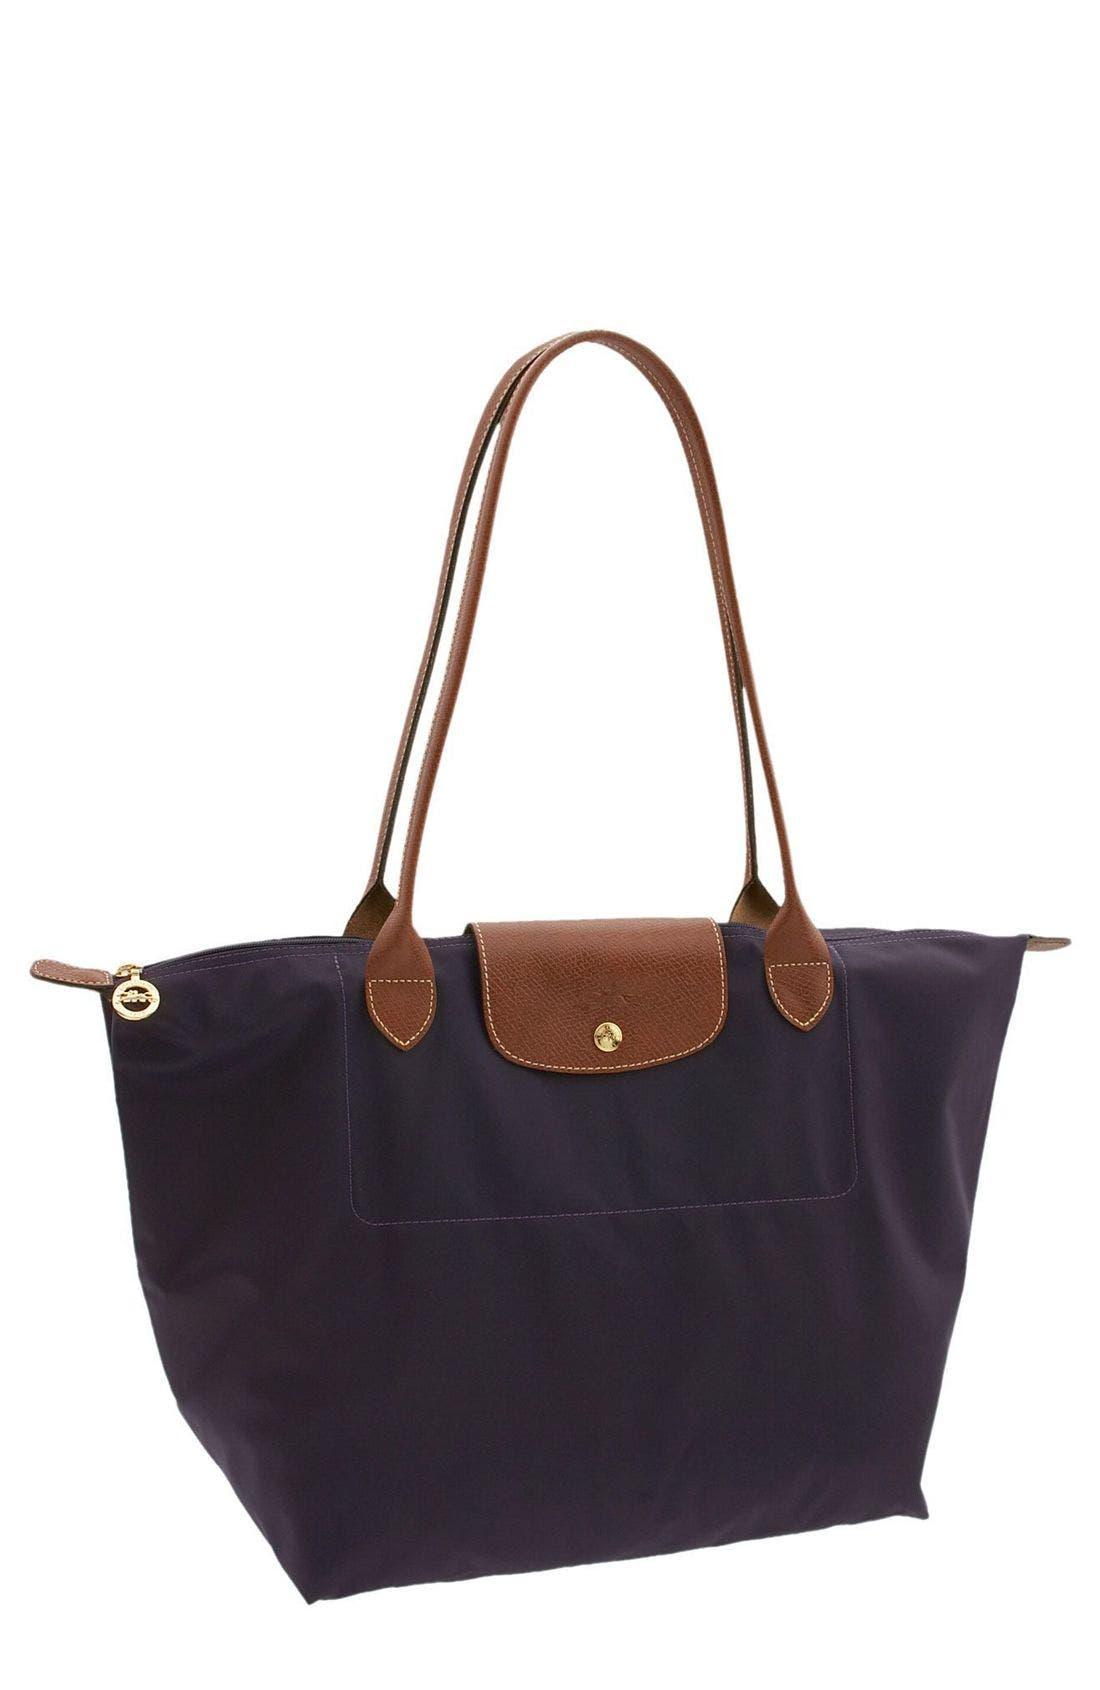 Alternate Image 1 Selected - Longchamp 'Le Pliage - Large' Tote Bag